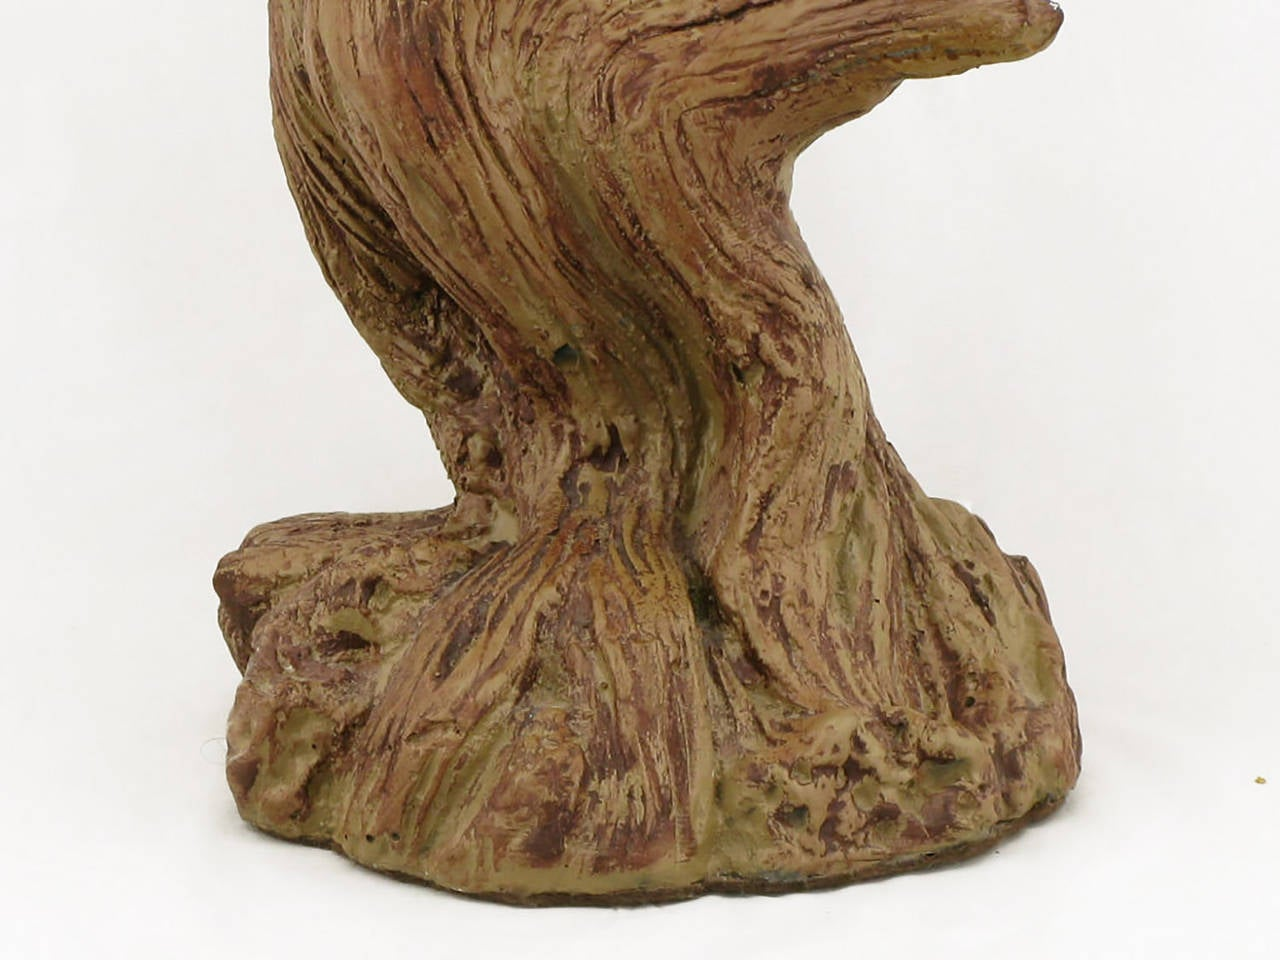 of ceramic driftwood form faux bois table lamps for sale at 1stdibs. Black Bedroom Furniture Sets. Home Design Ideas